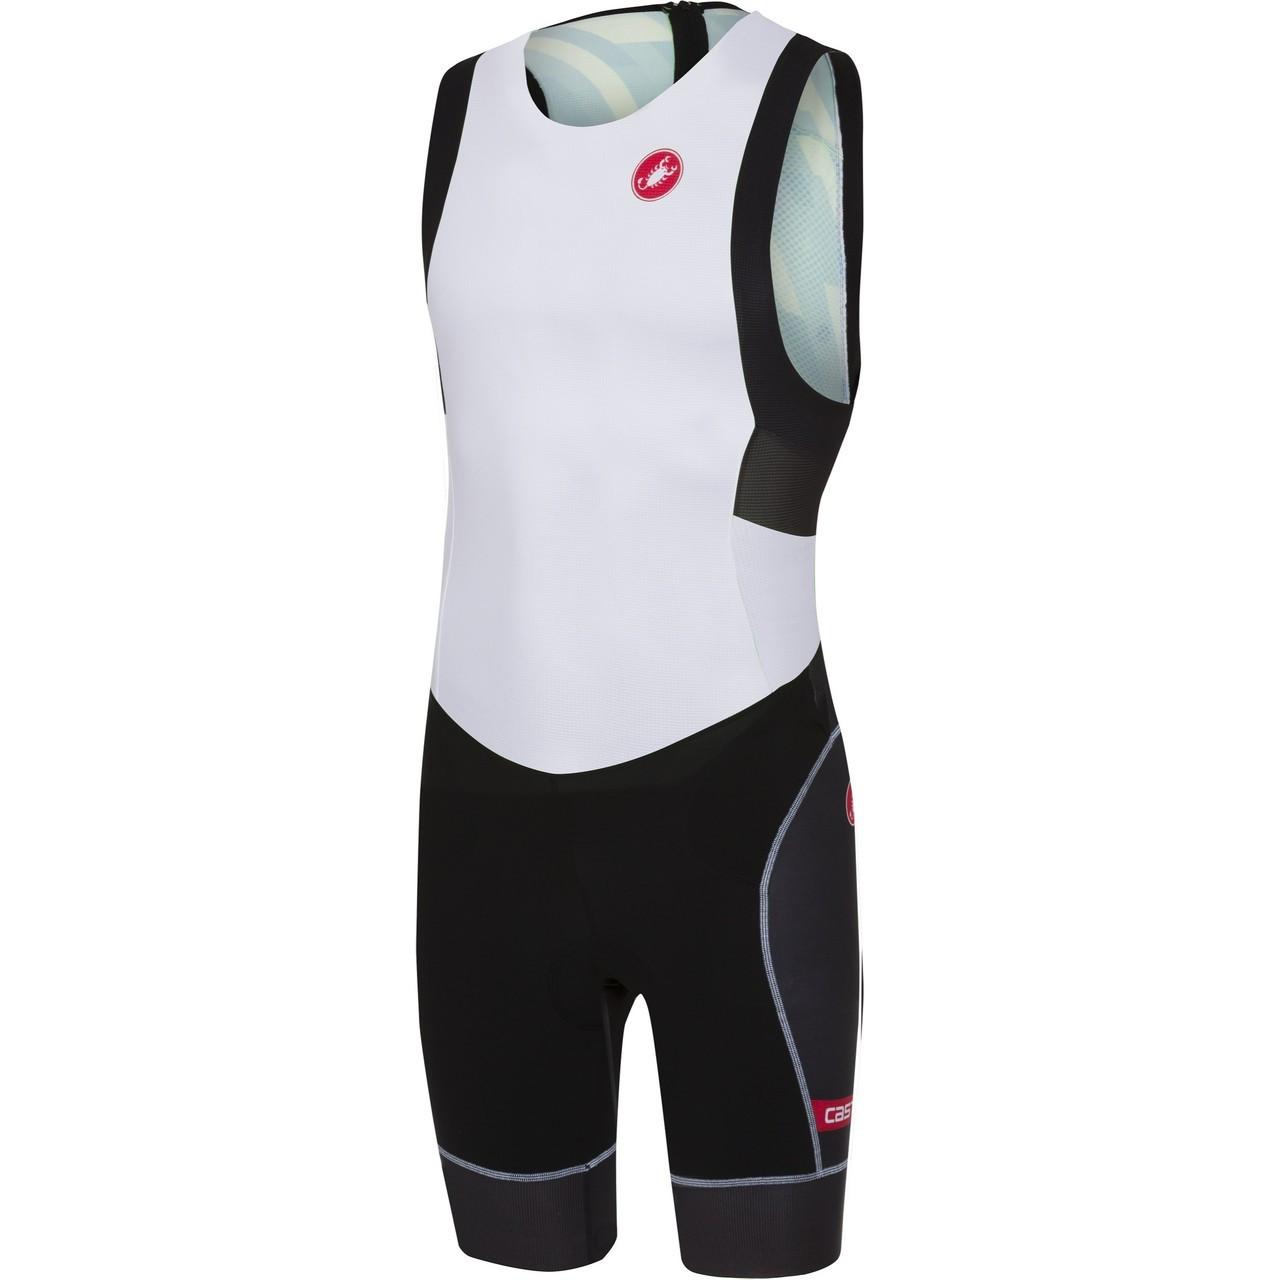 Ironman Suit Triathlon Details about  /Castelli Free Tri ITU Bike